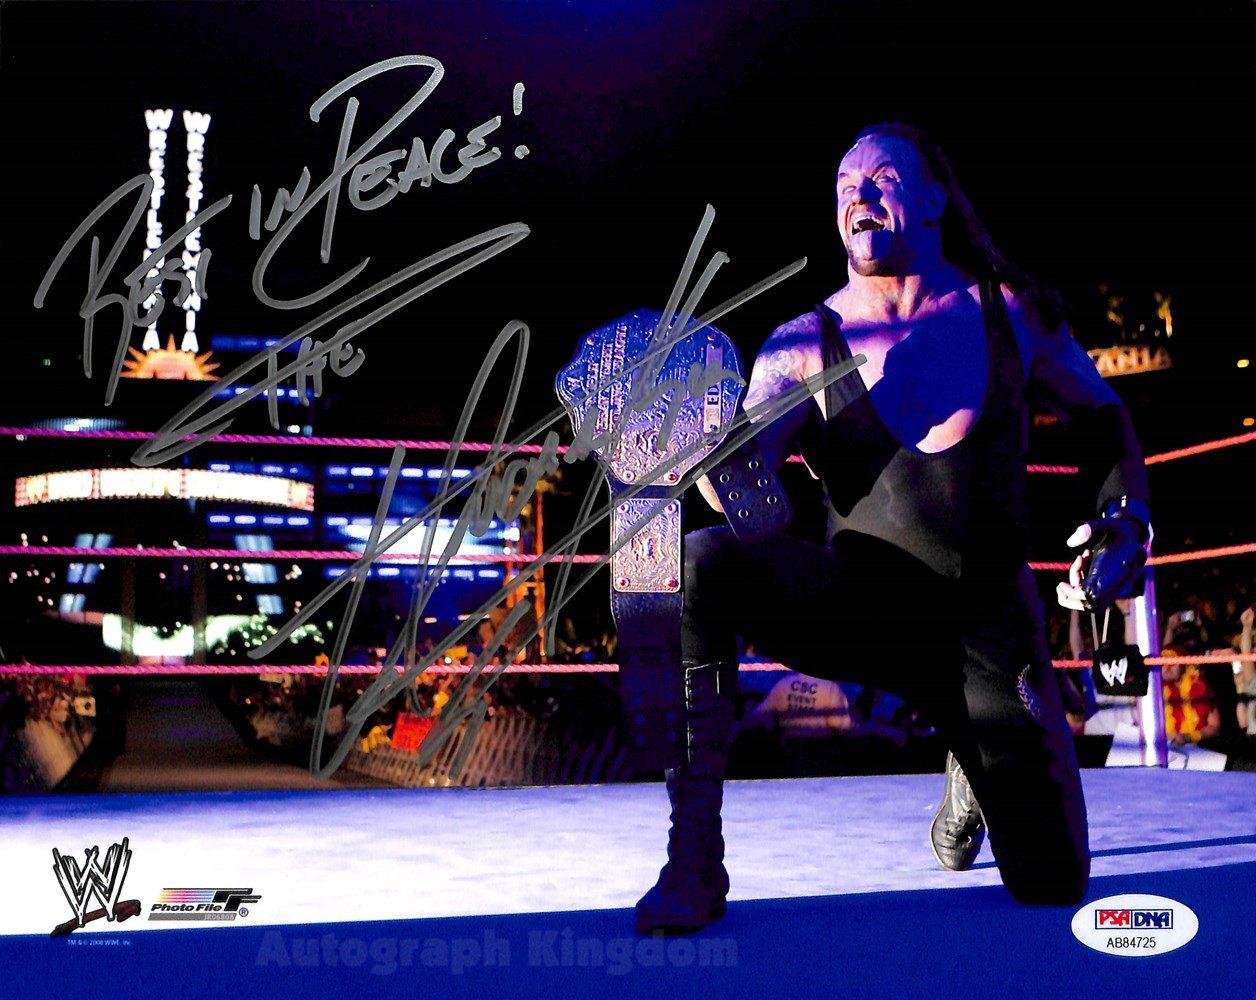 "The Undertaker WWF / WWE Wrestler 8 x 10"" Autographed Photo (Reprint Ref:1585)"